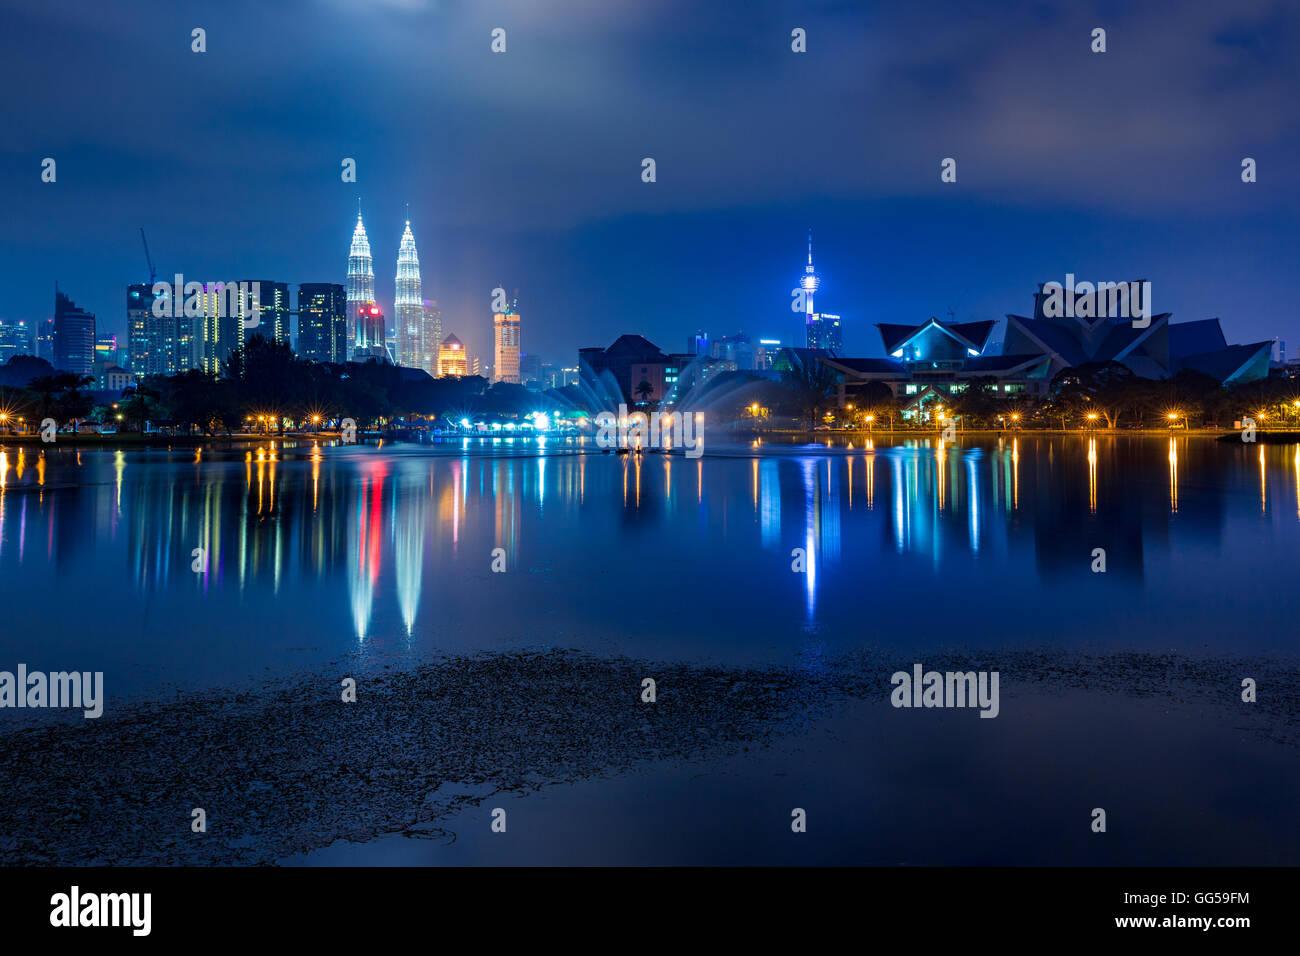 Kuala Lumpur skyline notturno come visto da Titiwangsa laghi, Kuala Lumpur, Malesia Immagini Stock